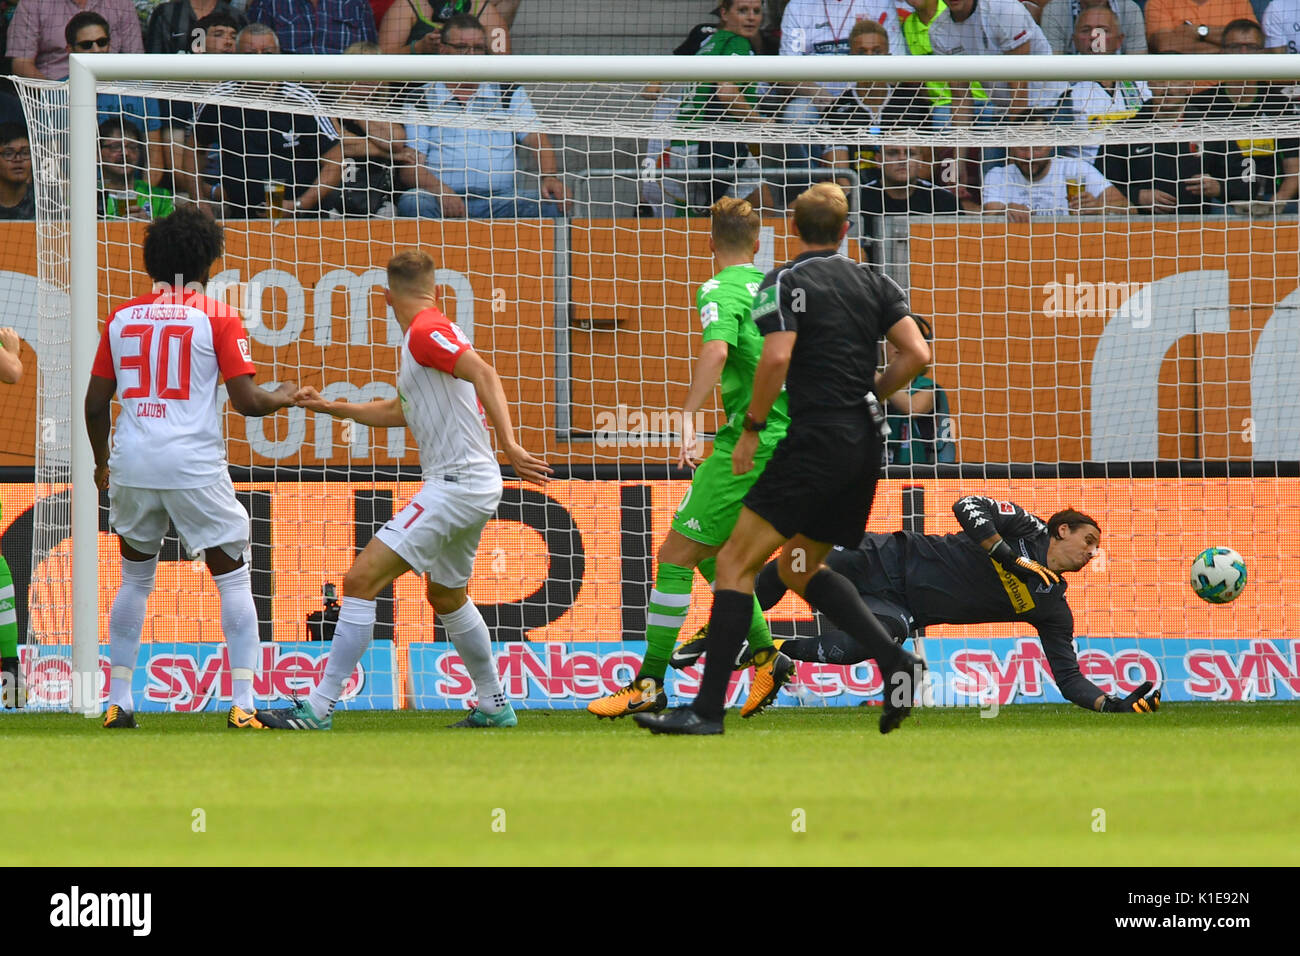 Alfred FINNBOGASON (FC Augsburg,2.v.li) schisst das Tor zum 1-0 gegen Yann SOMMER,Torwart,Torhueter (Borussia Monchengladbach).Aktion,Torschuss, Fussball 1. Bundesliga, 2.Spieltag,  FC Augsburg (A)-Borussia Monchengladbach (MG) 2-2, am 26.08.2017 in Augsburg/Deutschland,WWK   A R E N A. | Verwendung weltweit - Stock Image